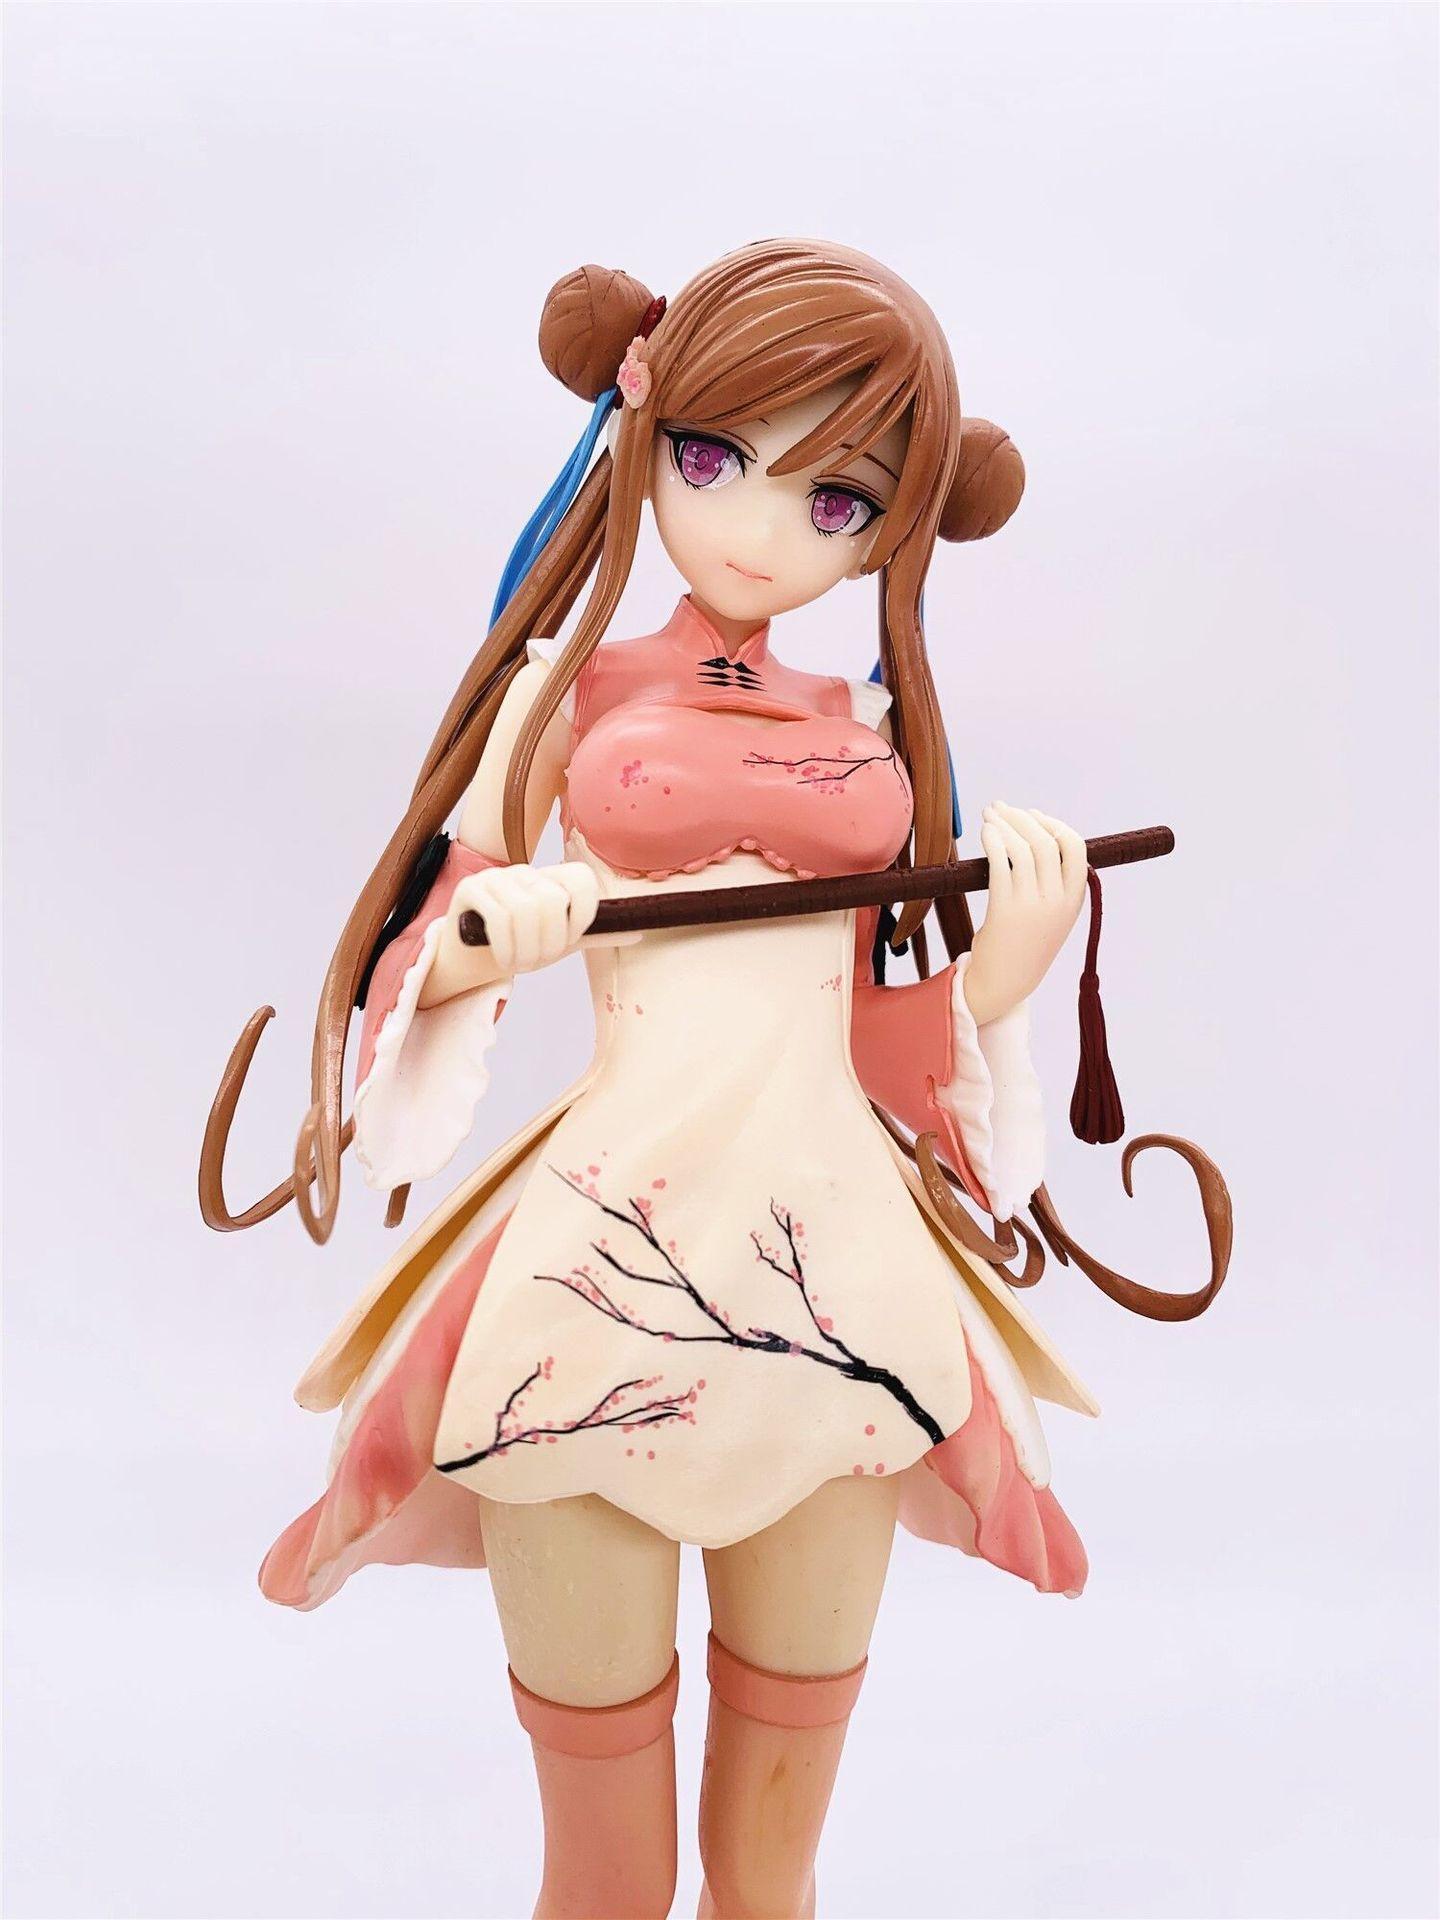 SkyTube Chun Mei Prime T2 Art fille TONY Sexy Girls debout Ver. 1/6 Peinte Anime action PVC Figure Modèle Jouets lelakaya T191214